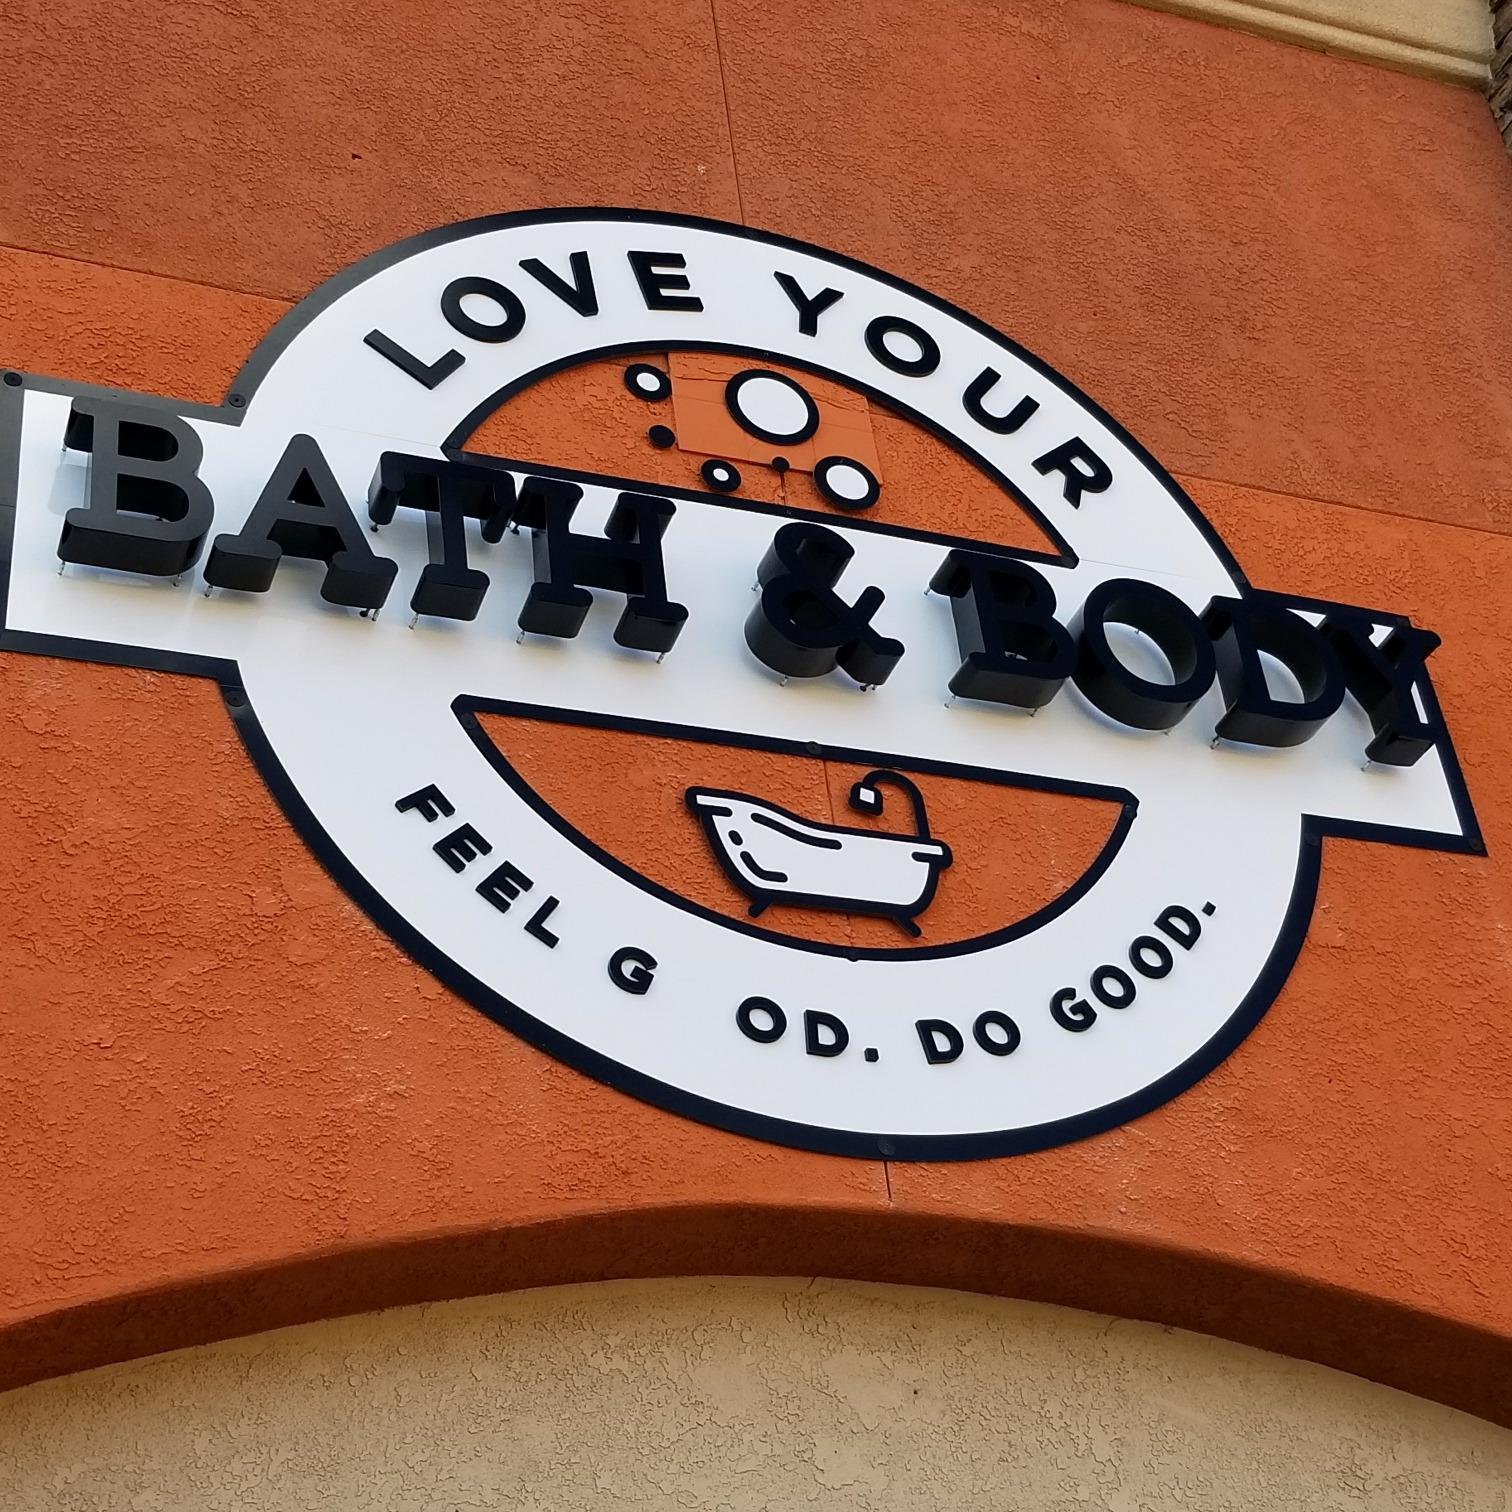 Love Your Body & Bath image 16